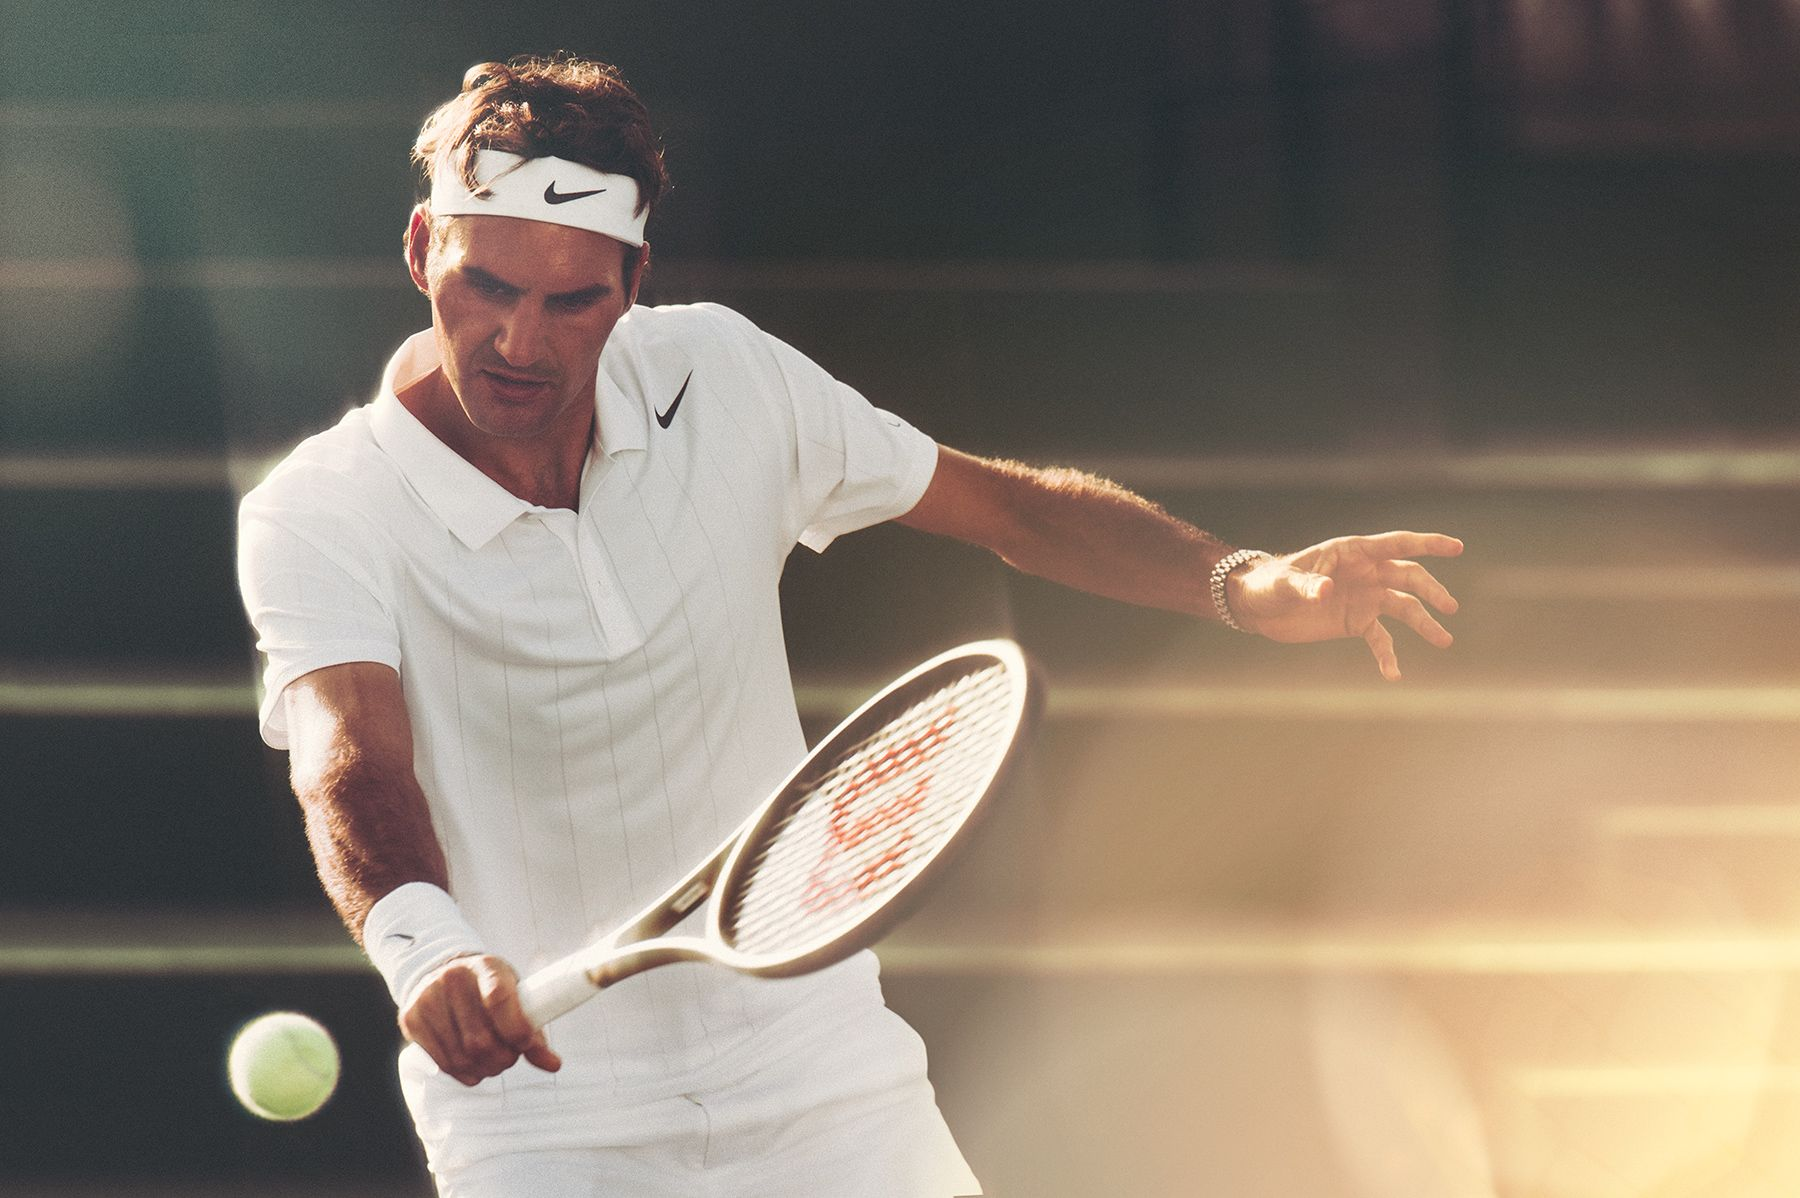 ENDLESS SUMMER Nike tennis, Roger federer, Tennis